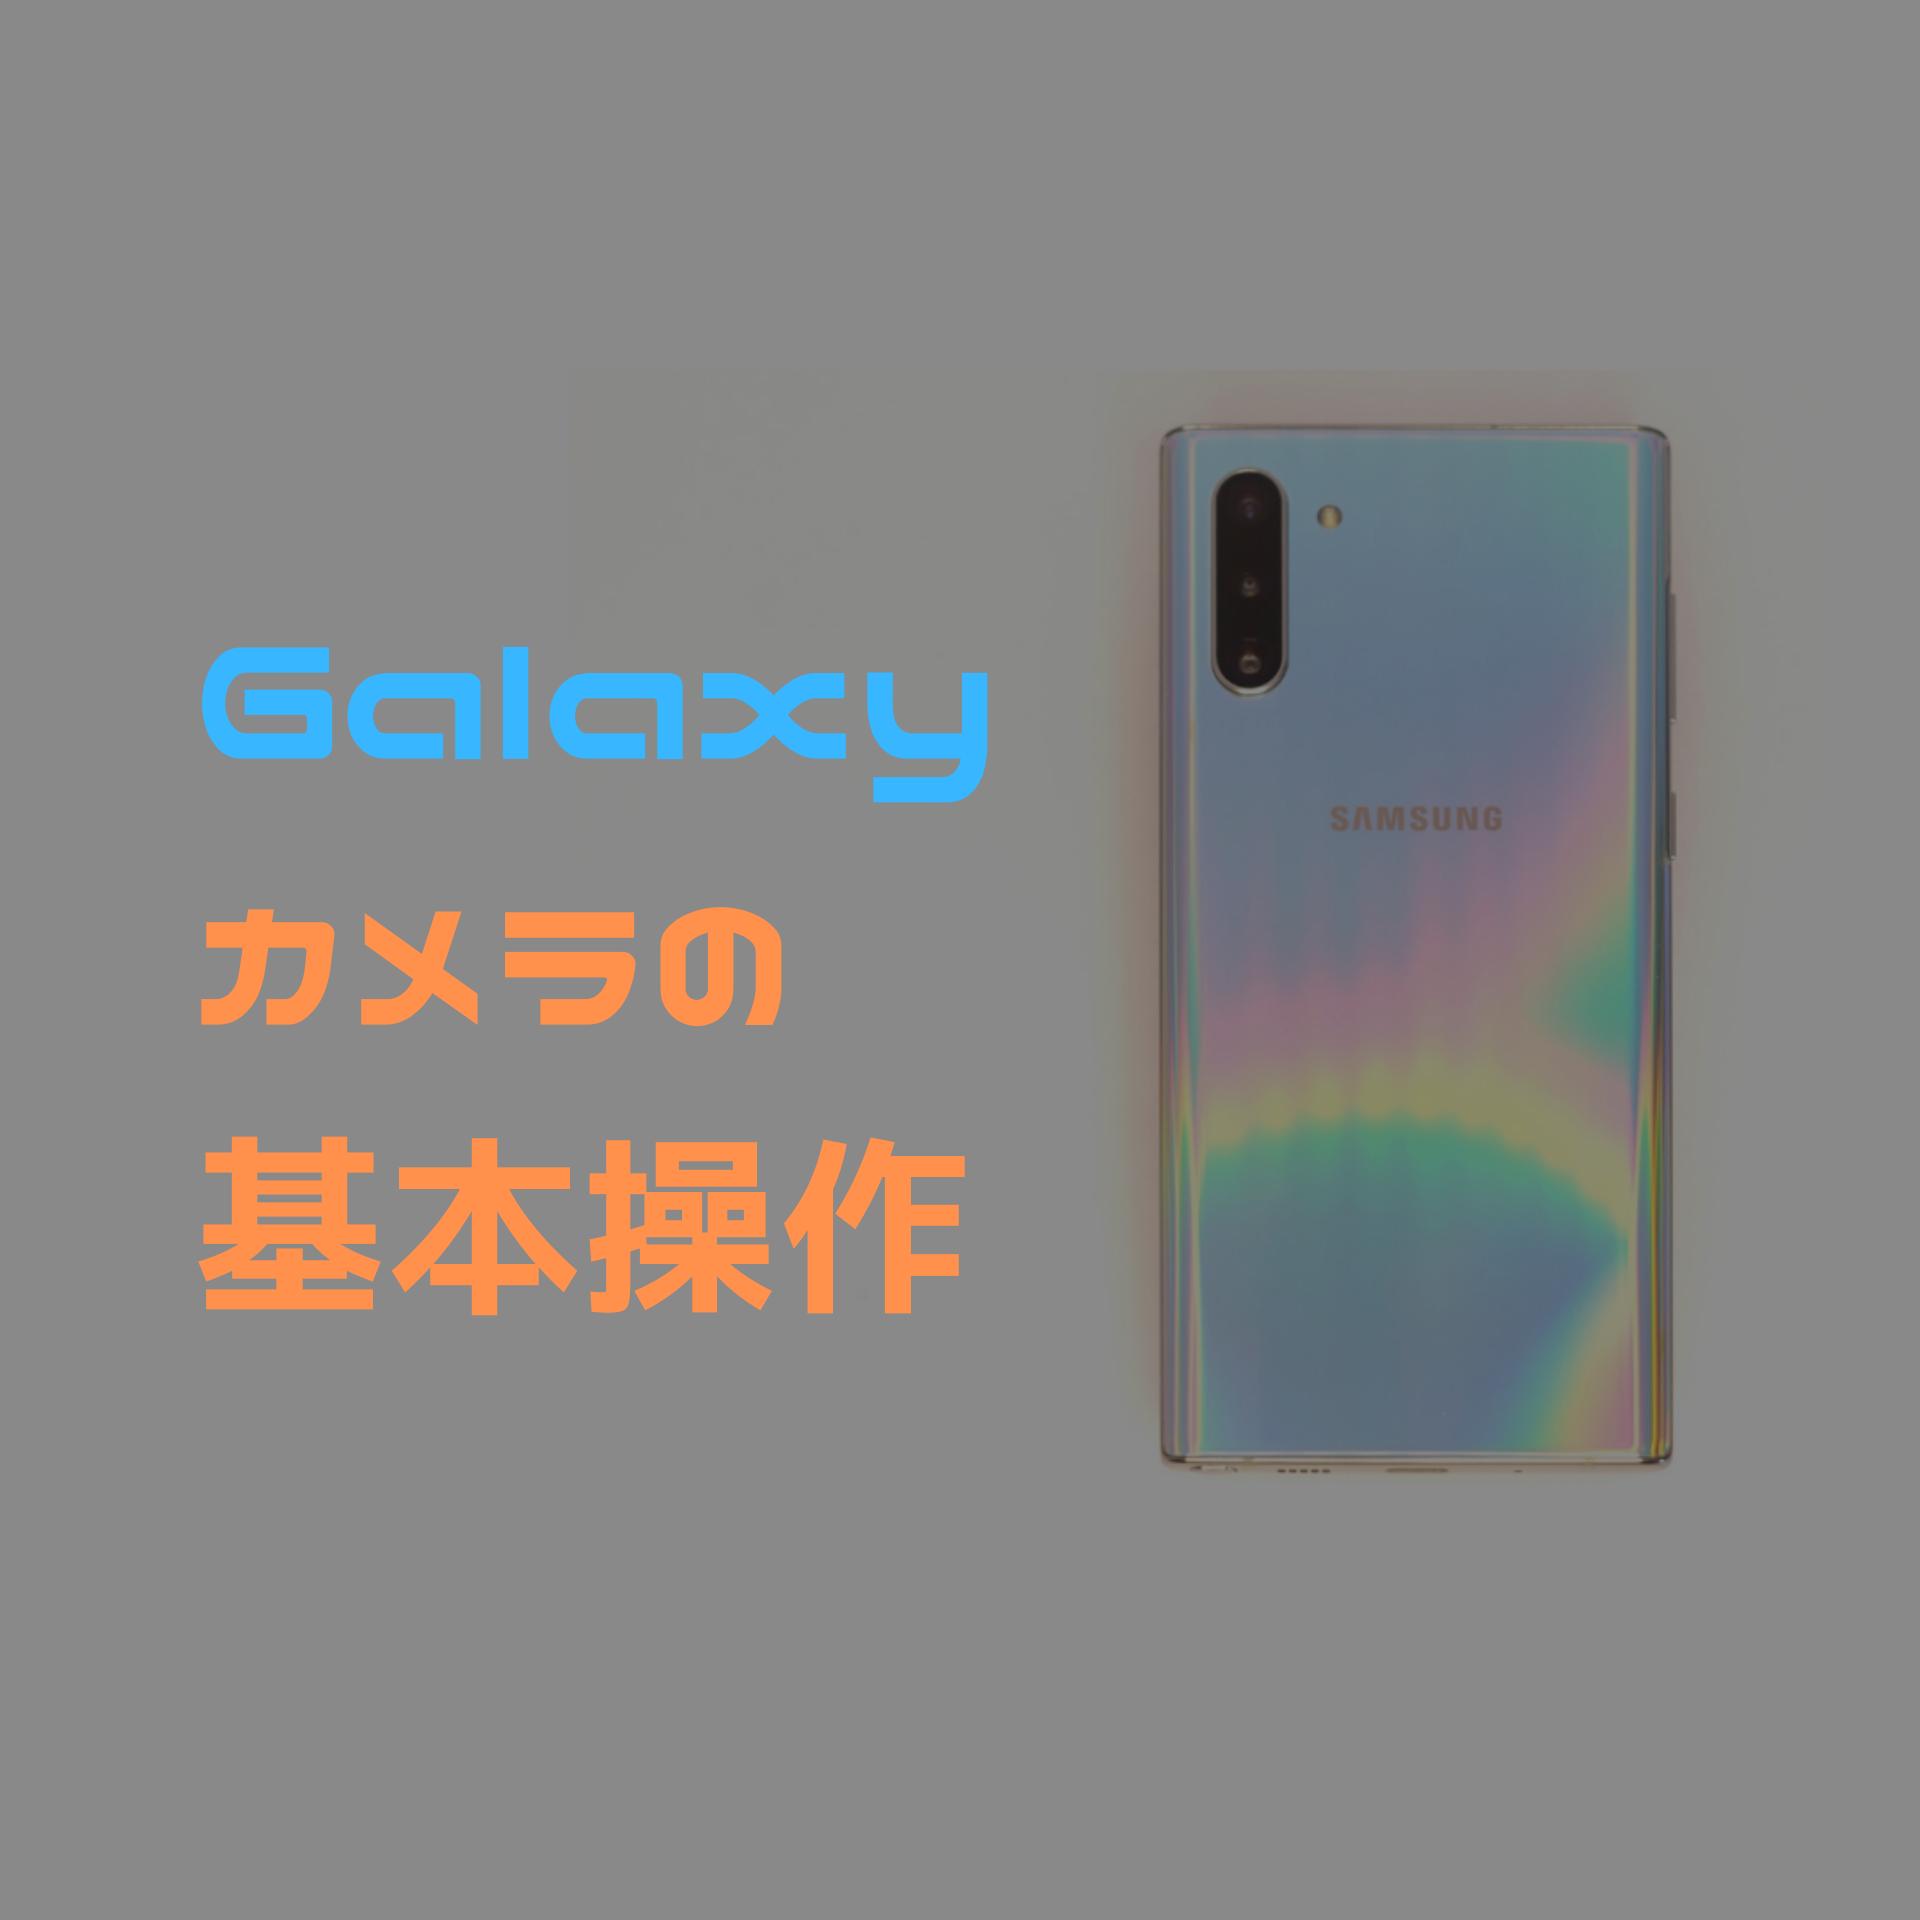 【Galaxy】カメラの基本操作をマスターせよ!